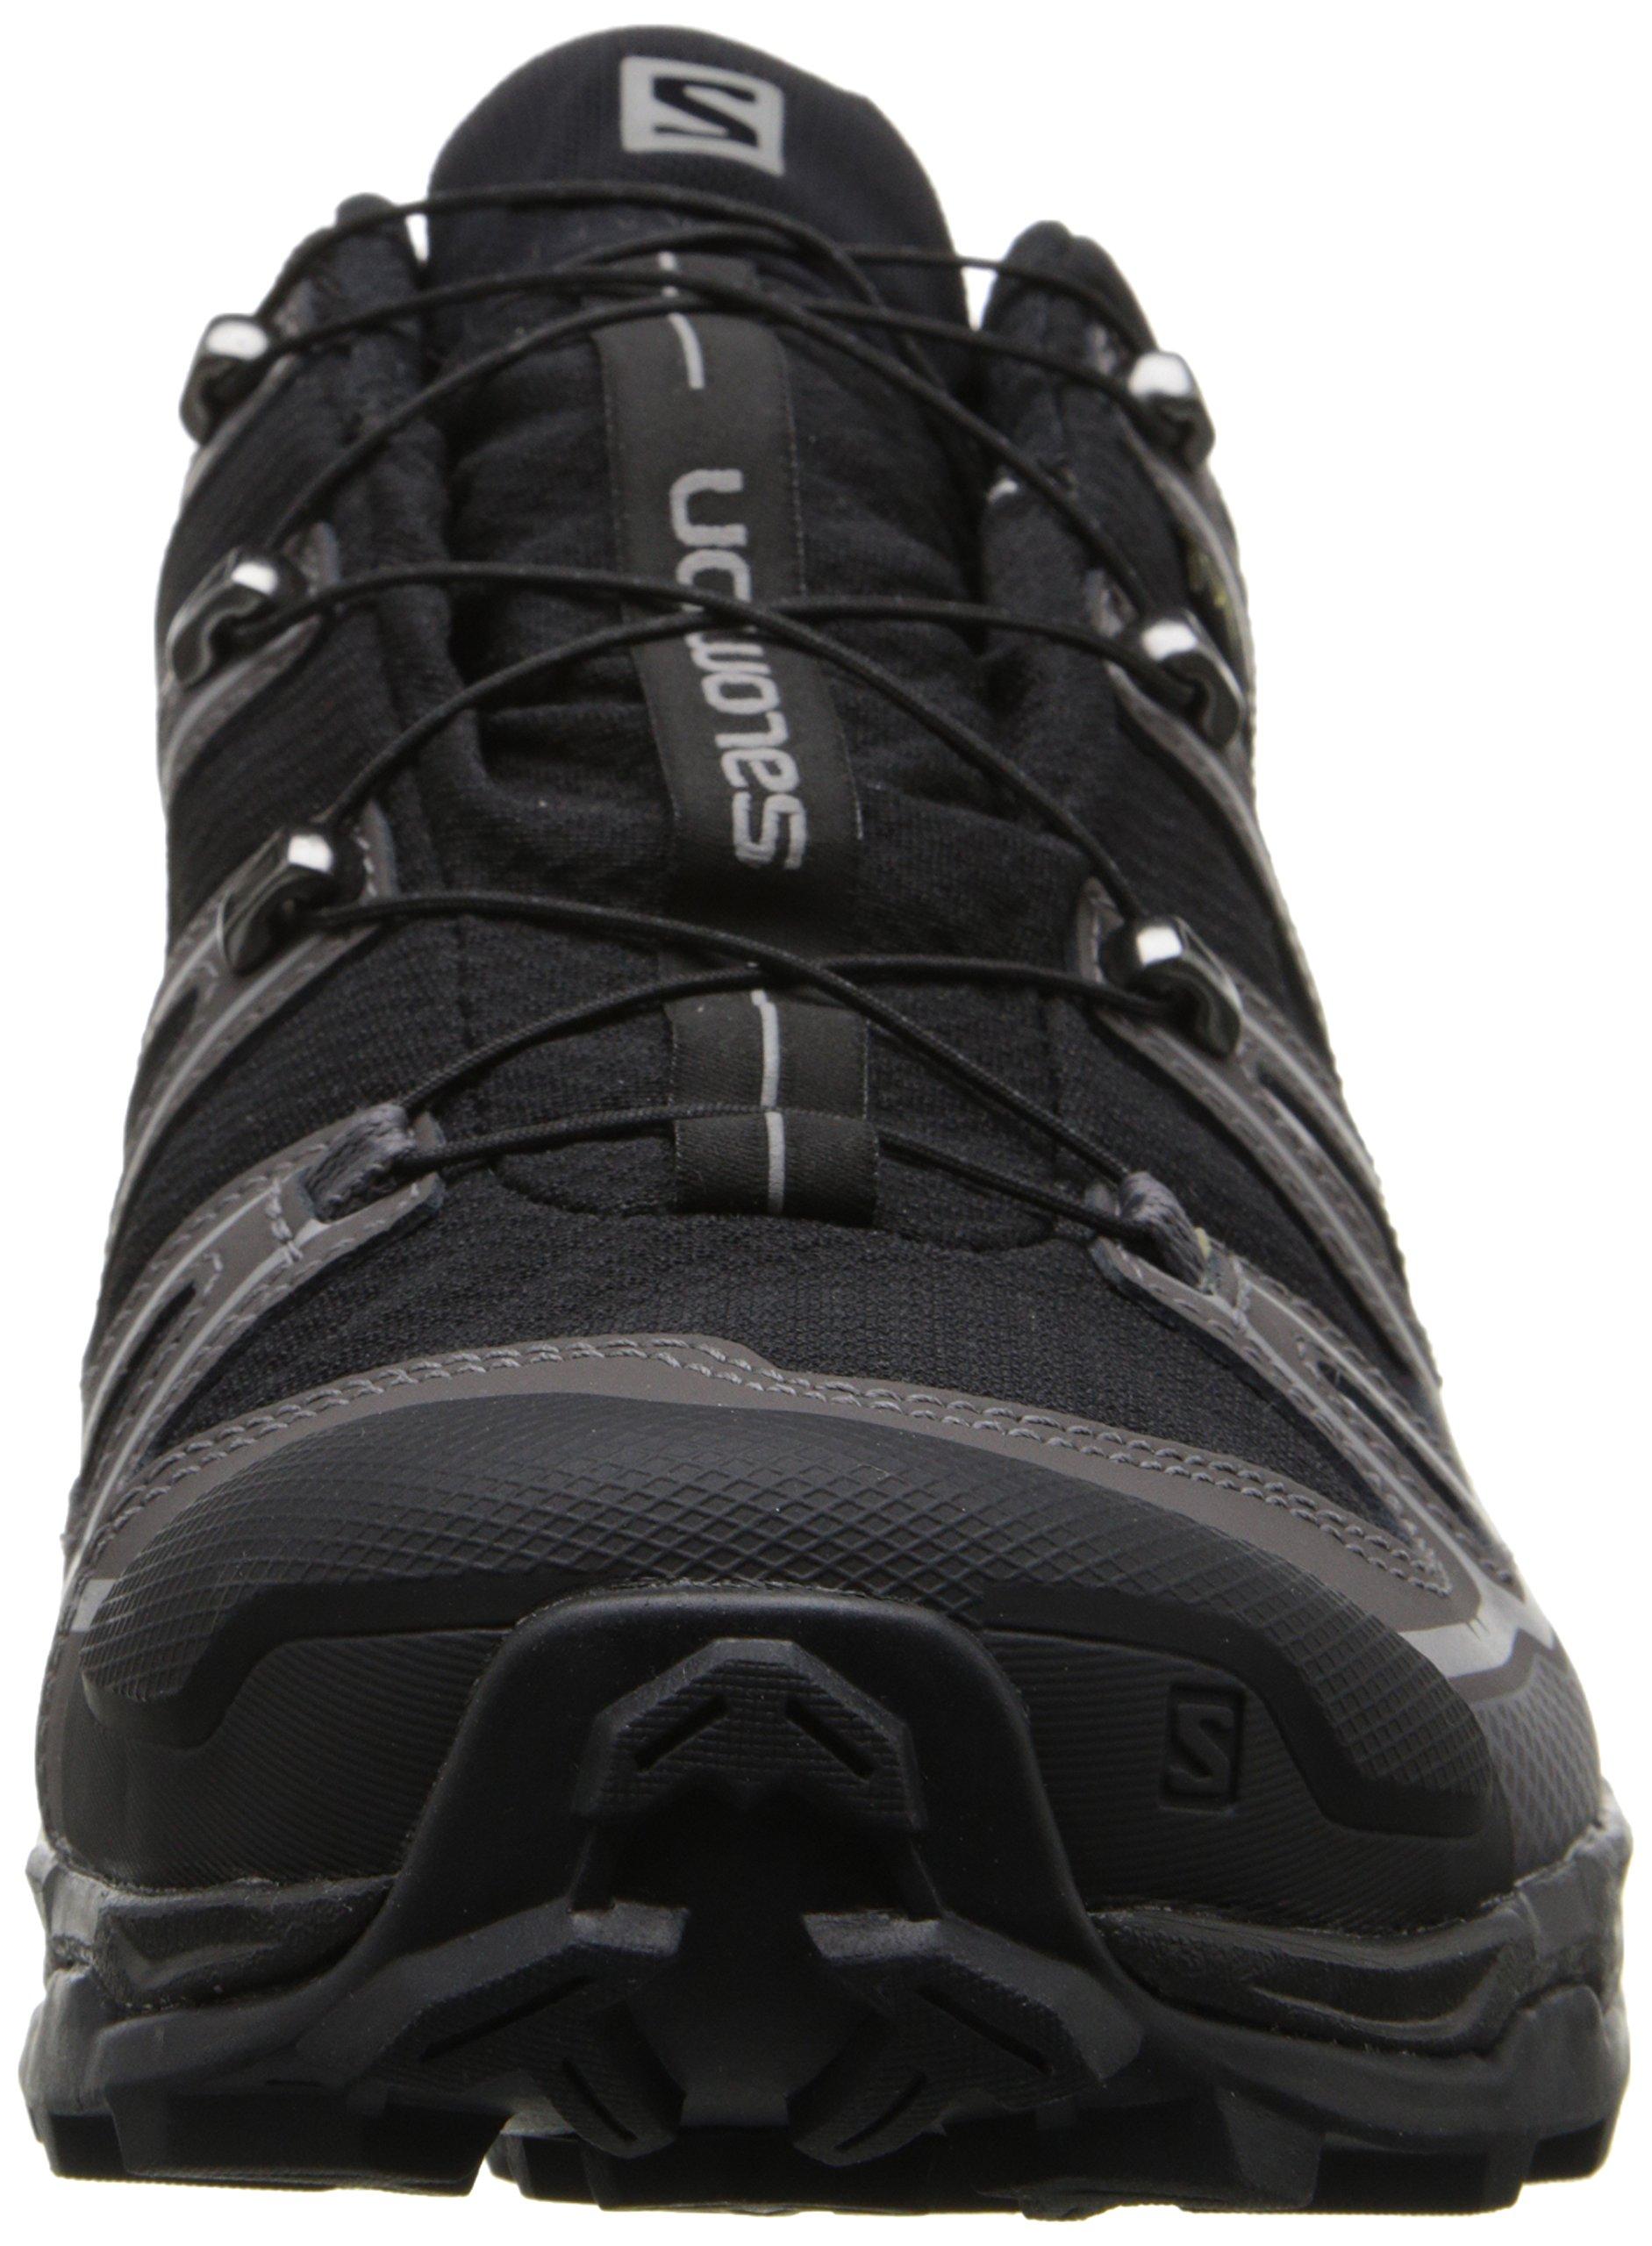 Salomon Men's X Ultra 2 GTX Hiking Shoe, Black/Autobahn/Aluminum, 7 M US by Salomon (Image #4)